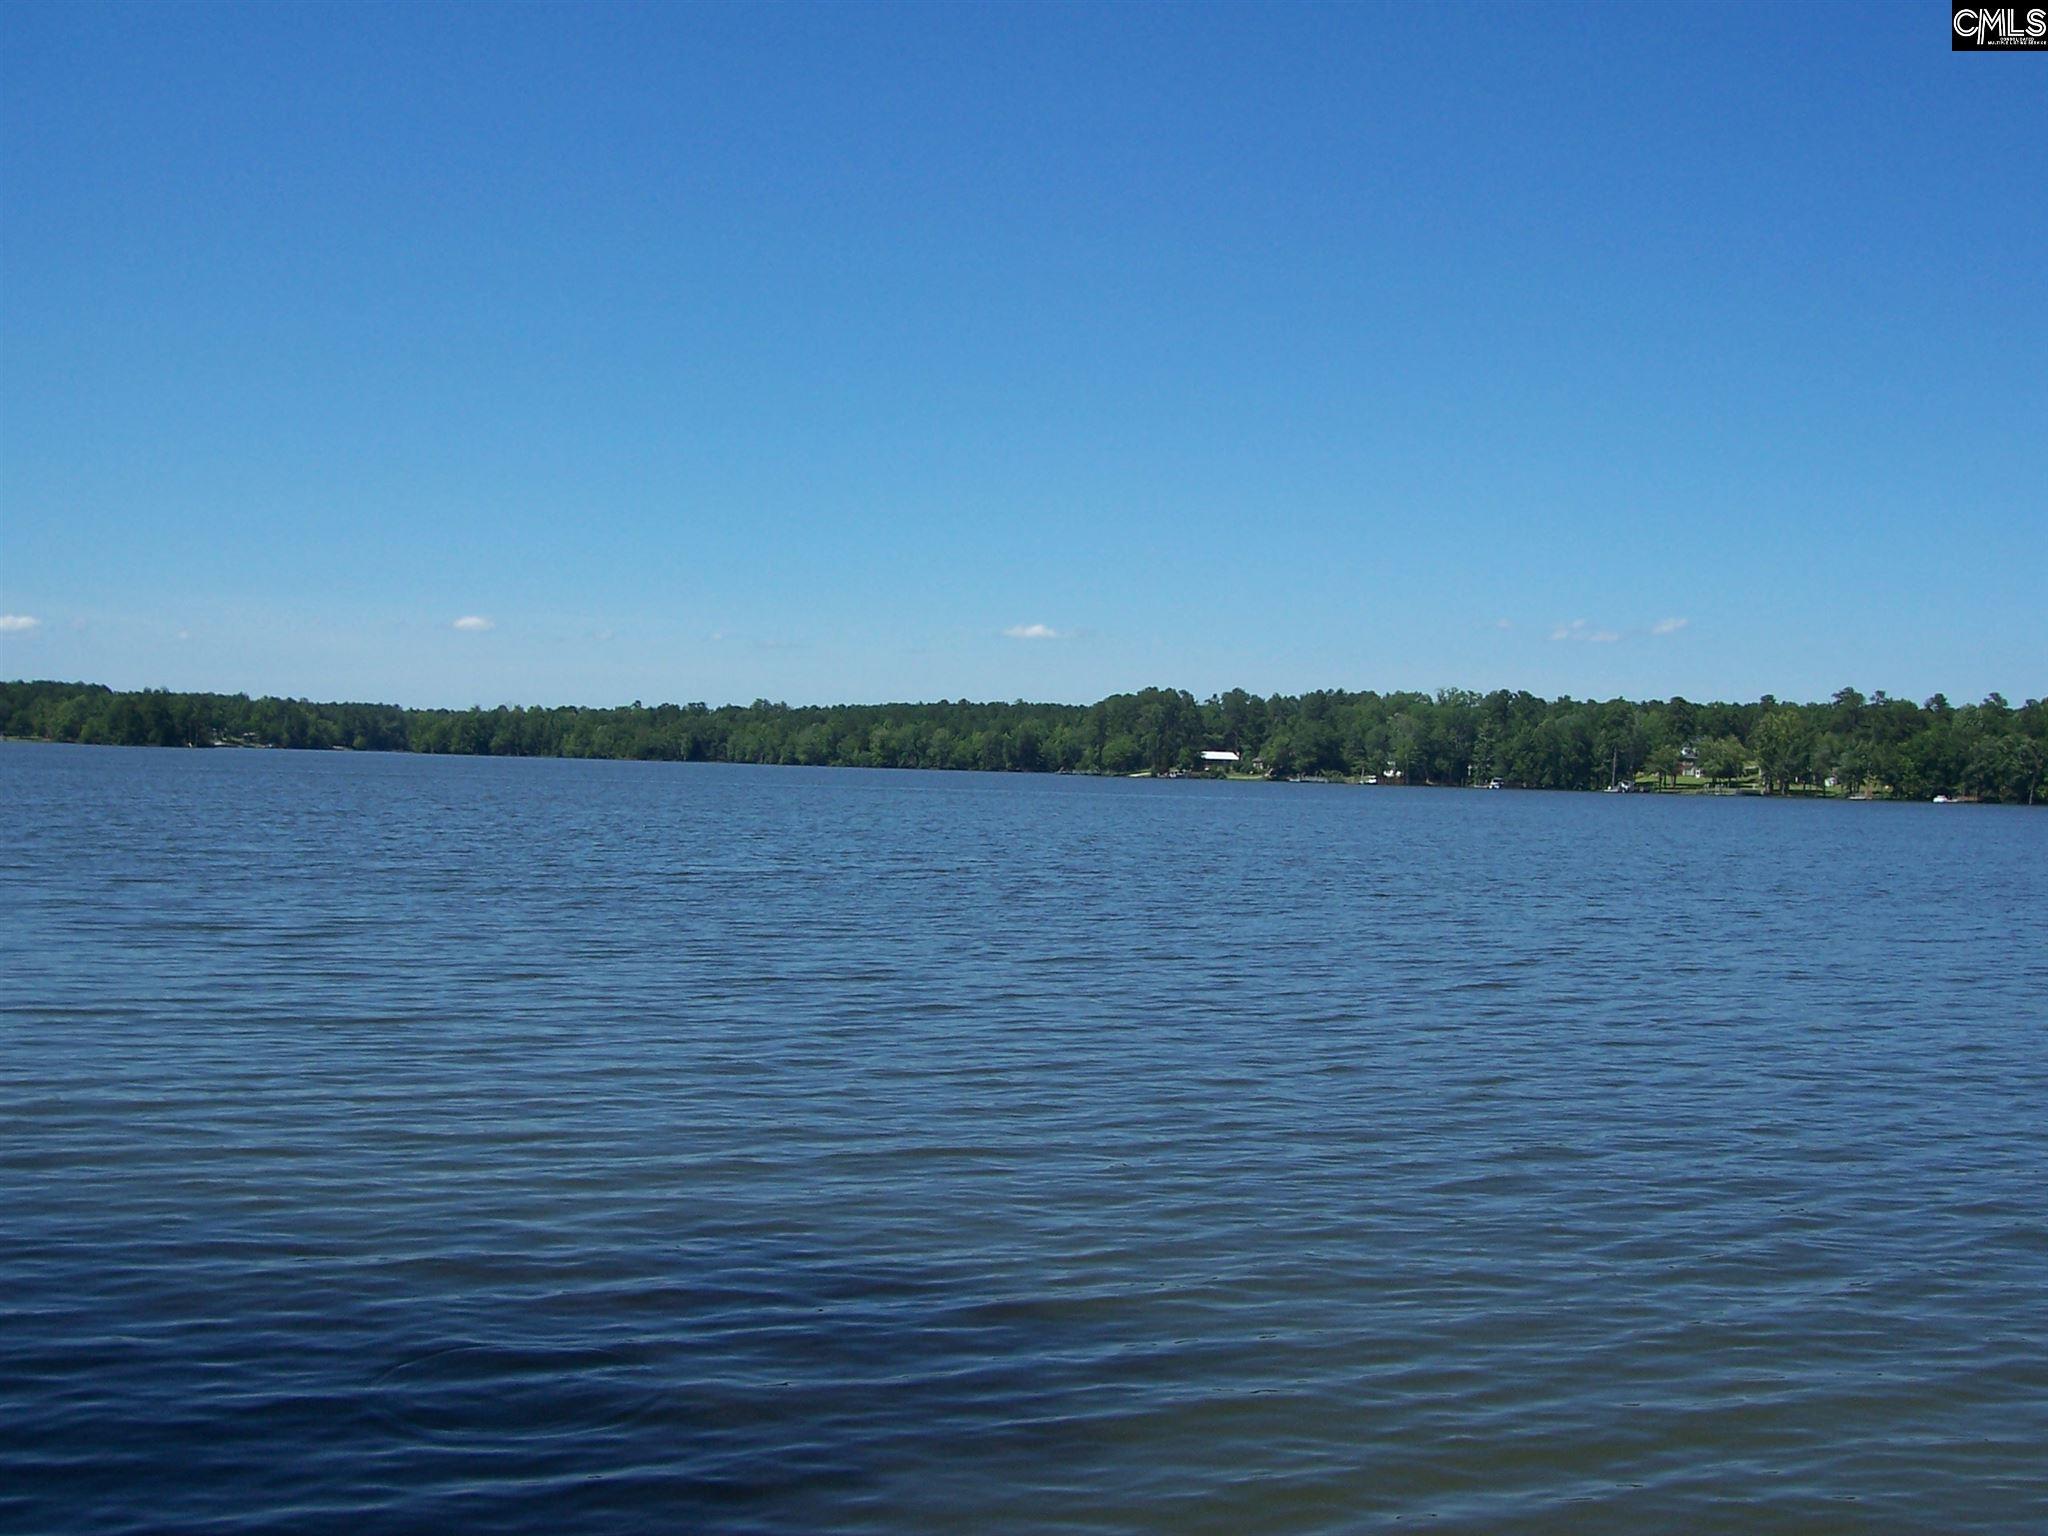 Wyses Ferry Prosperity, SC 29127